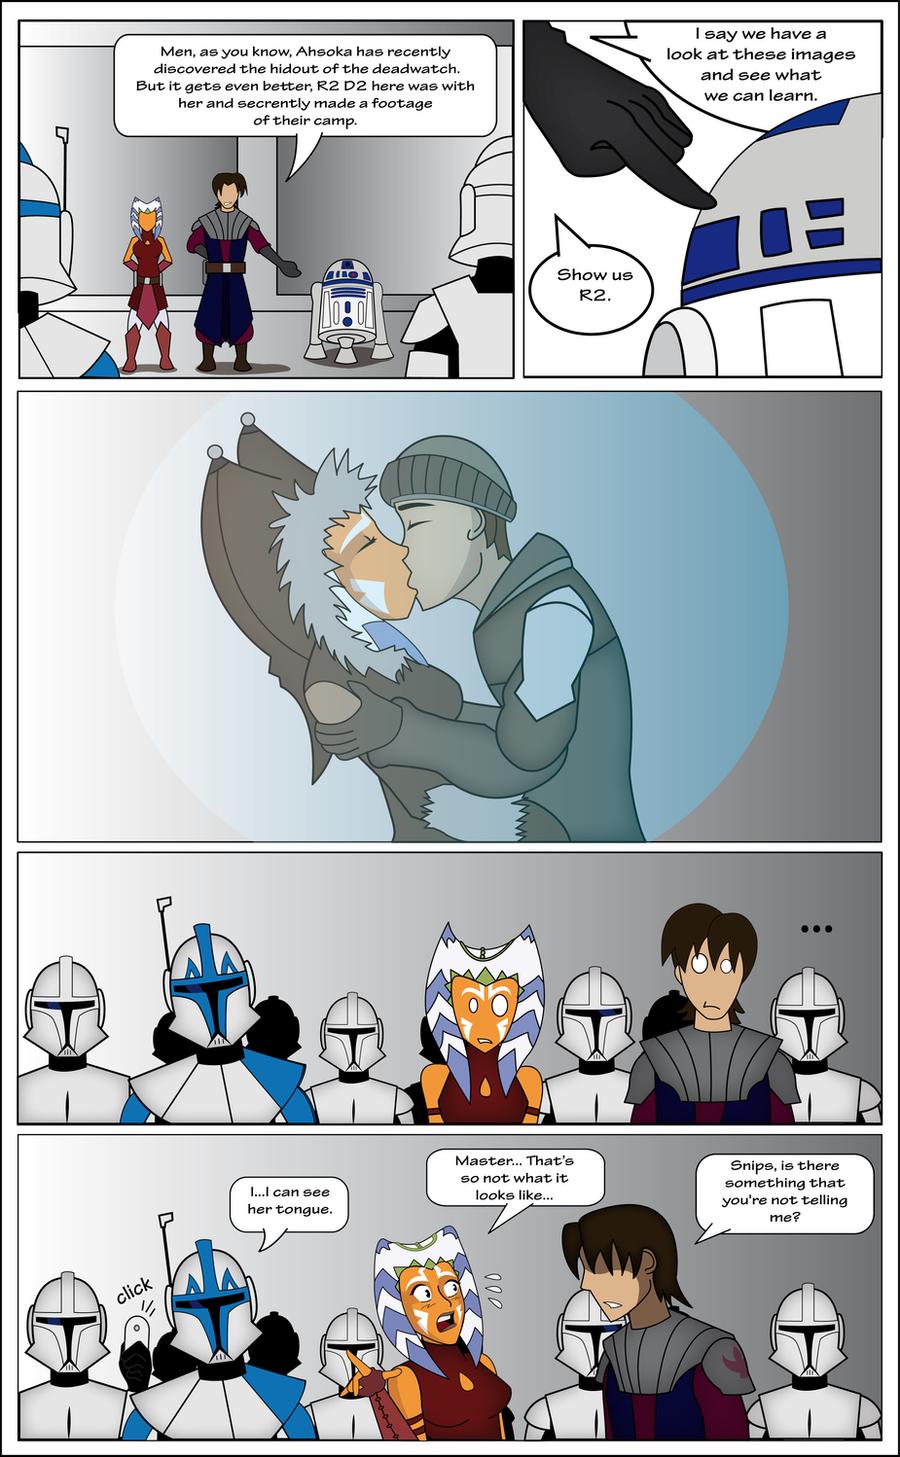 Star Wars] An Open Secret | Page 16 | SpaceBattles Forums